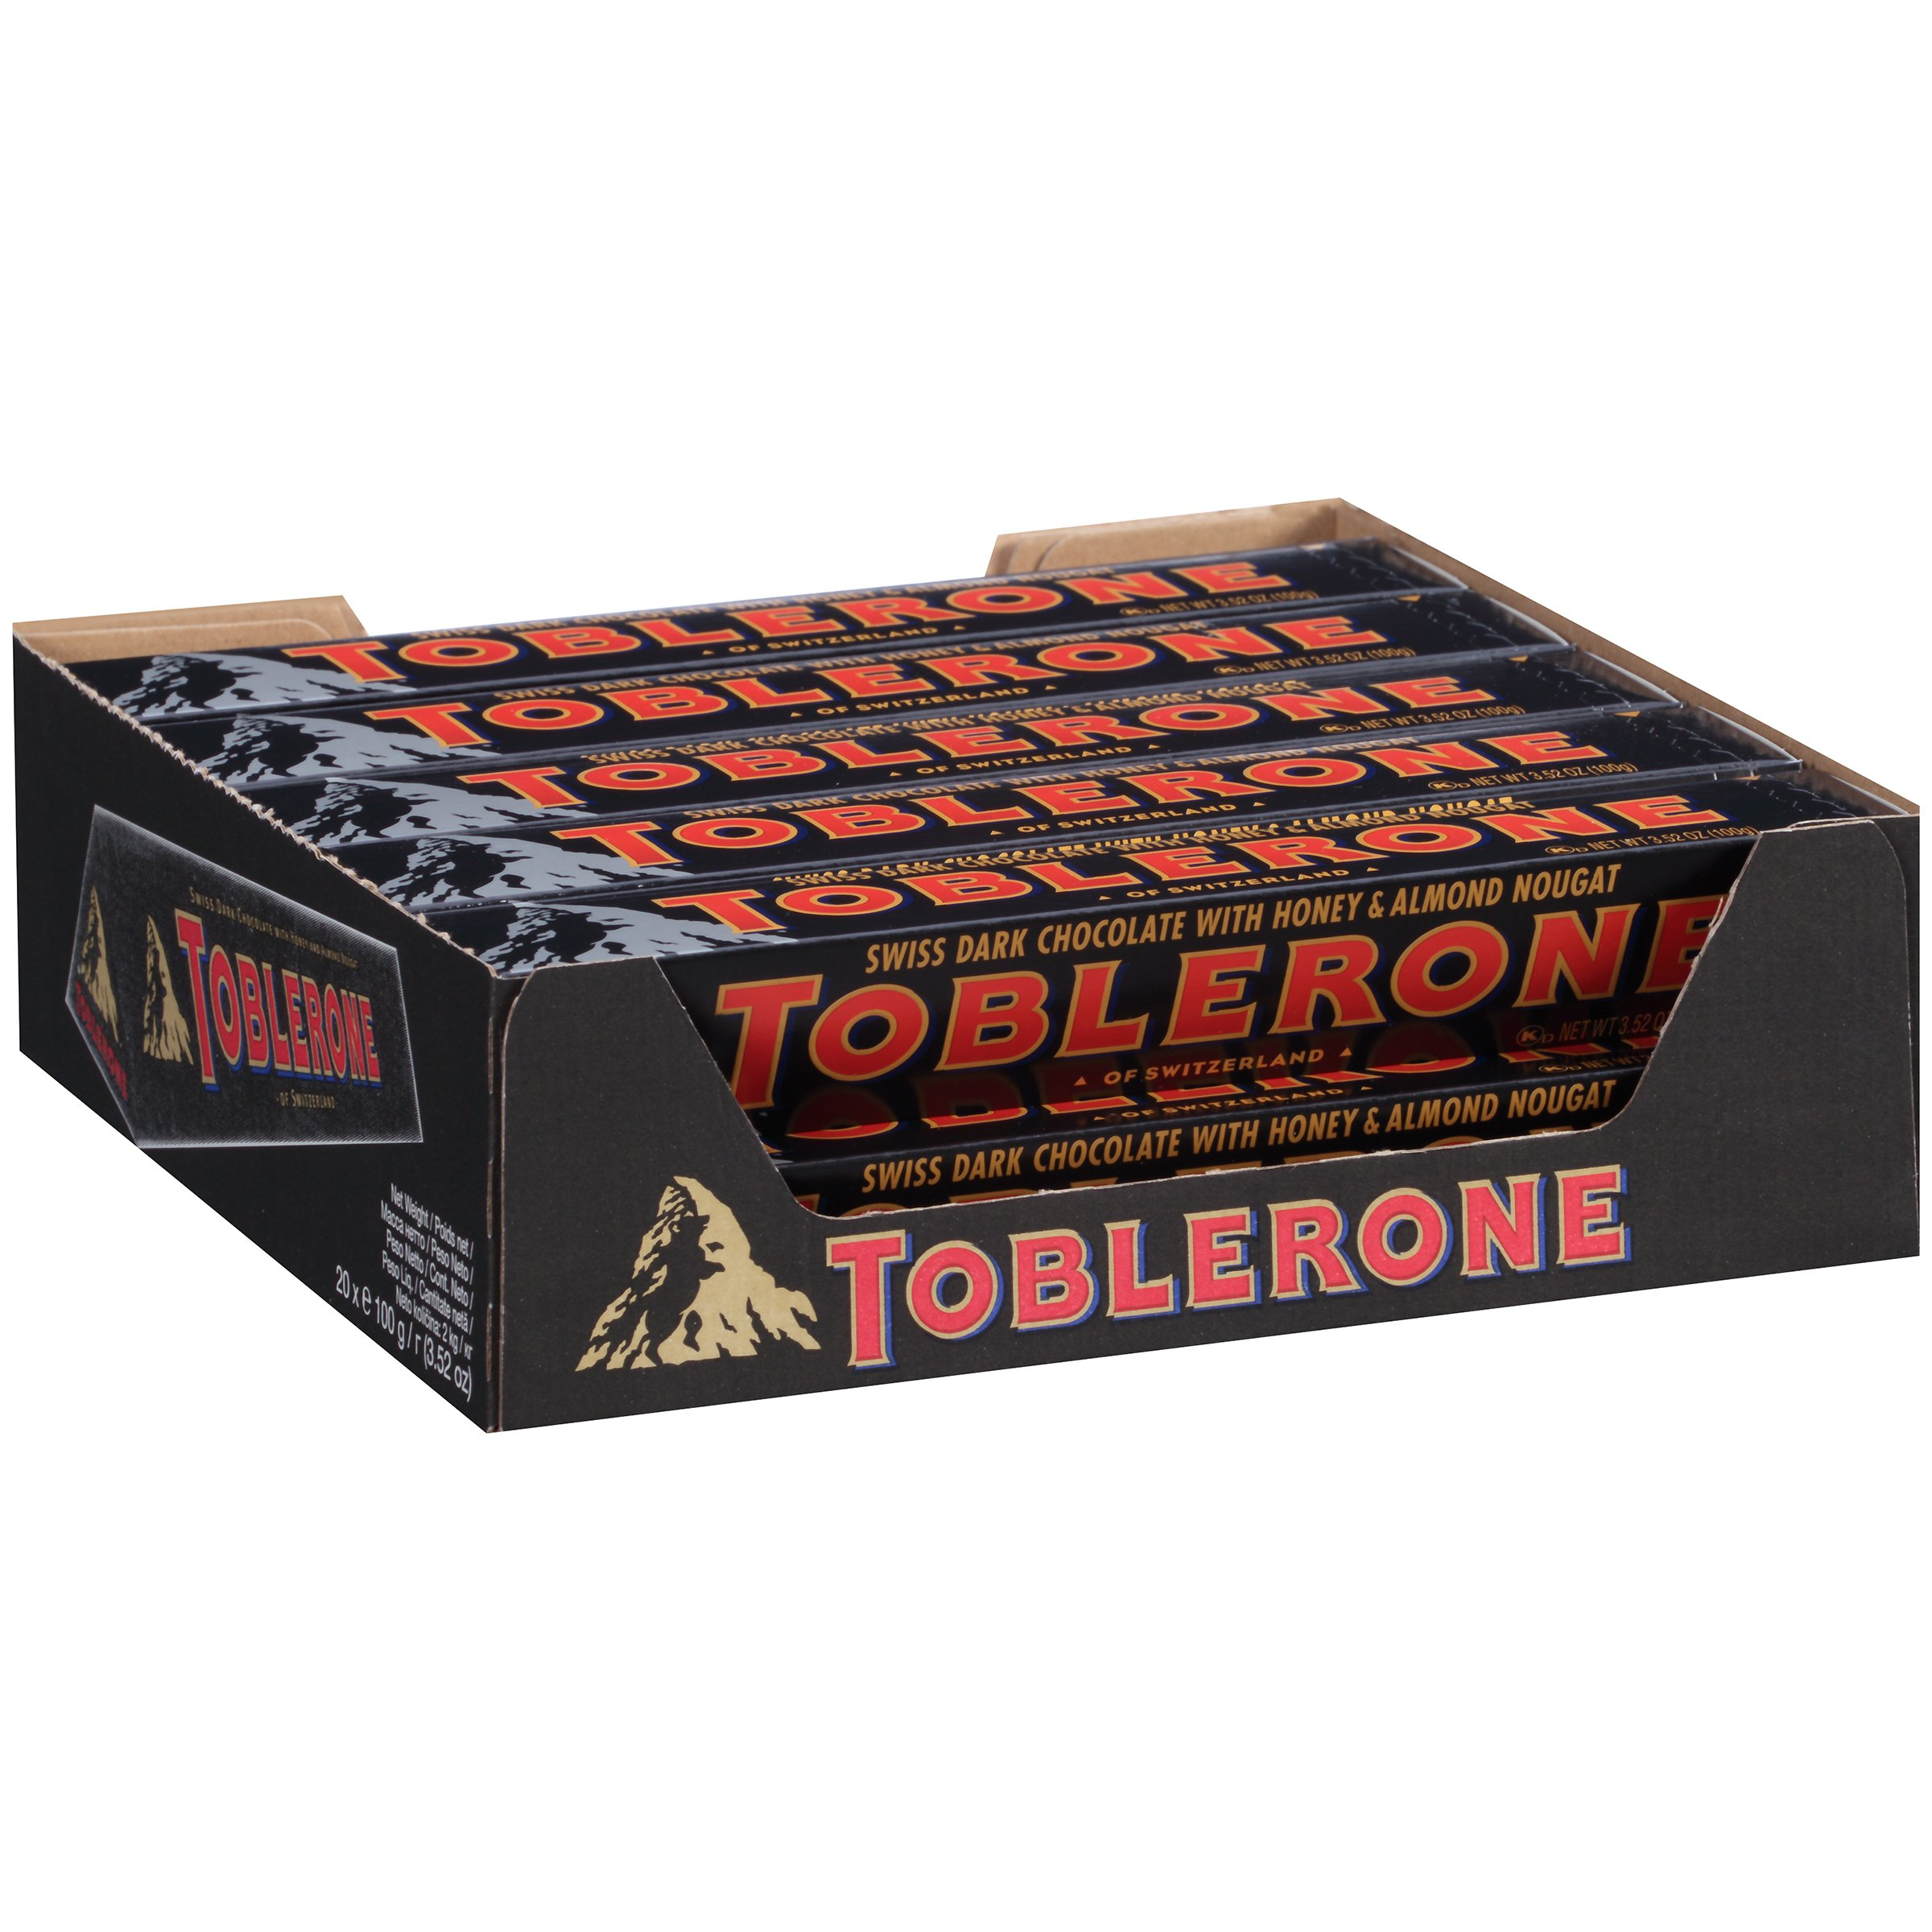 Toblerone Chocolate Bar, Dark, 3.52 Ounce (Pack of 20) by Toblerone (Image #3)